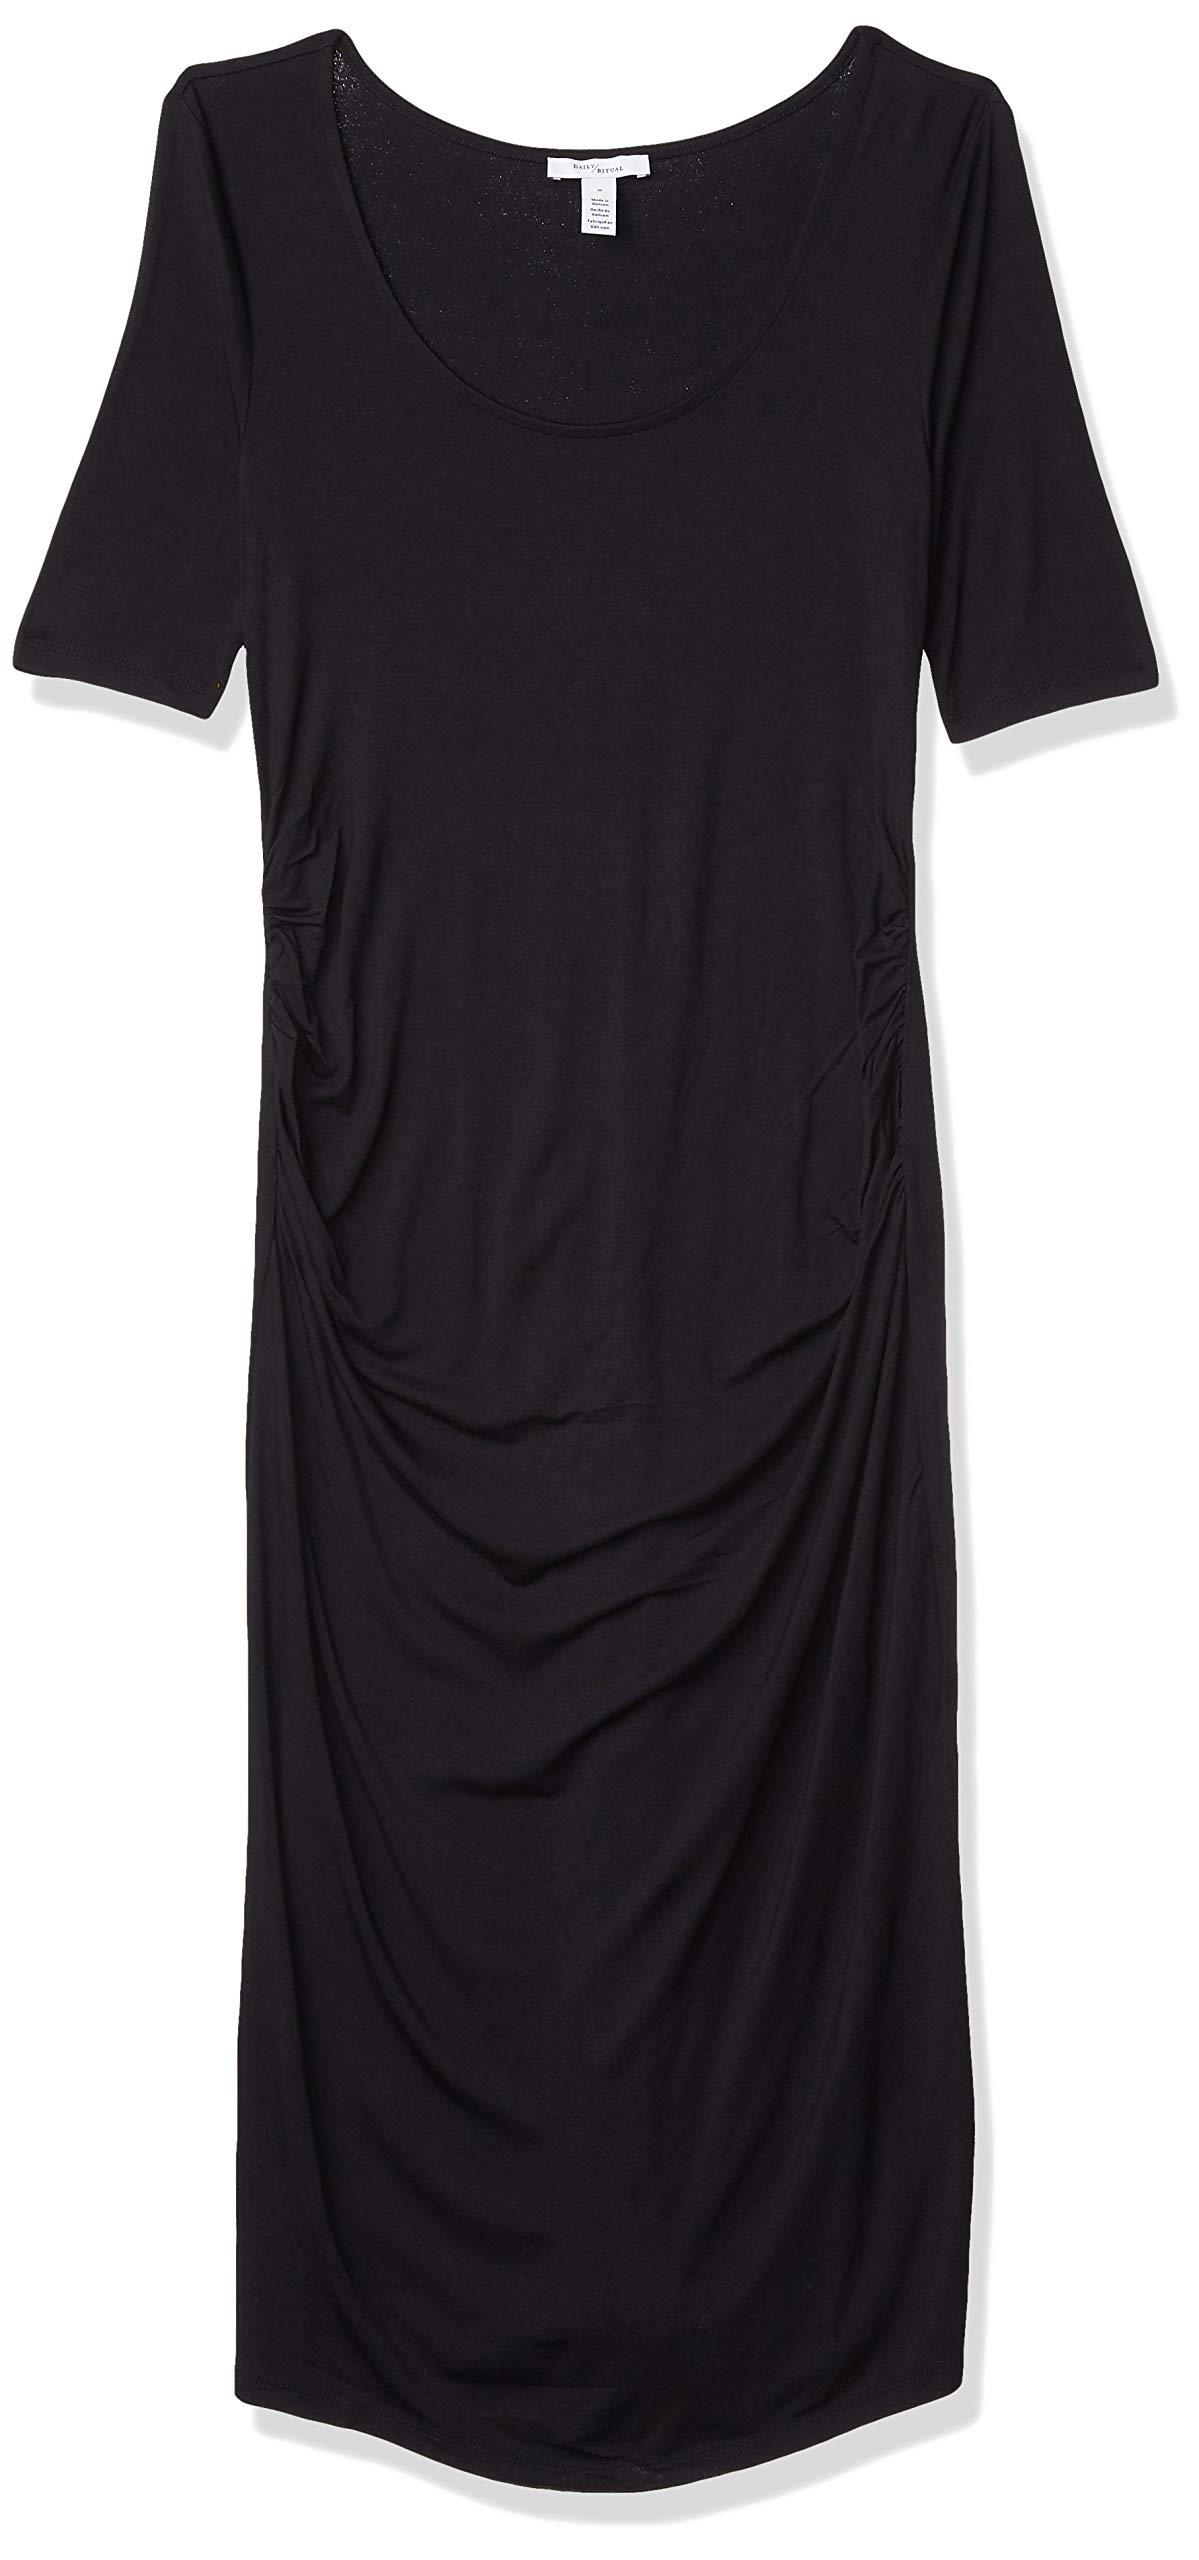 Amazon Brand - Daily Ritual Women's Maternity Elbow-Sleeve Dress